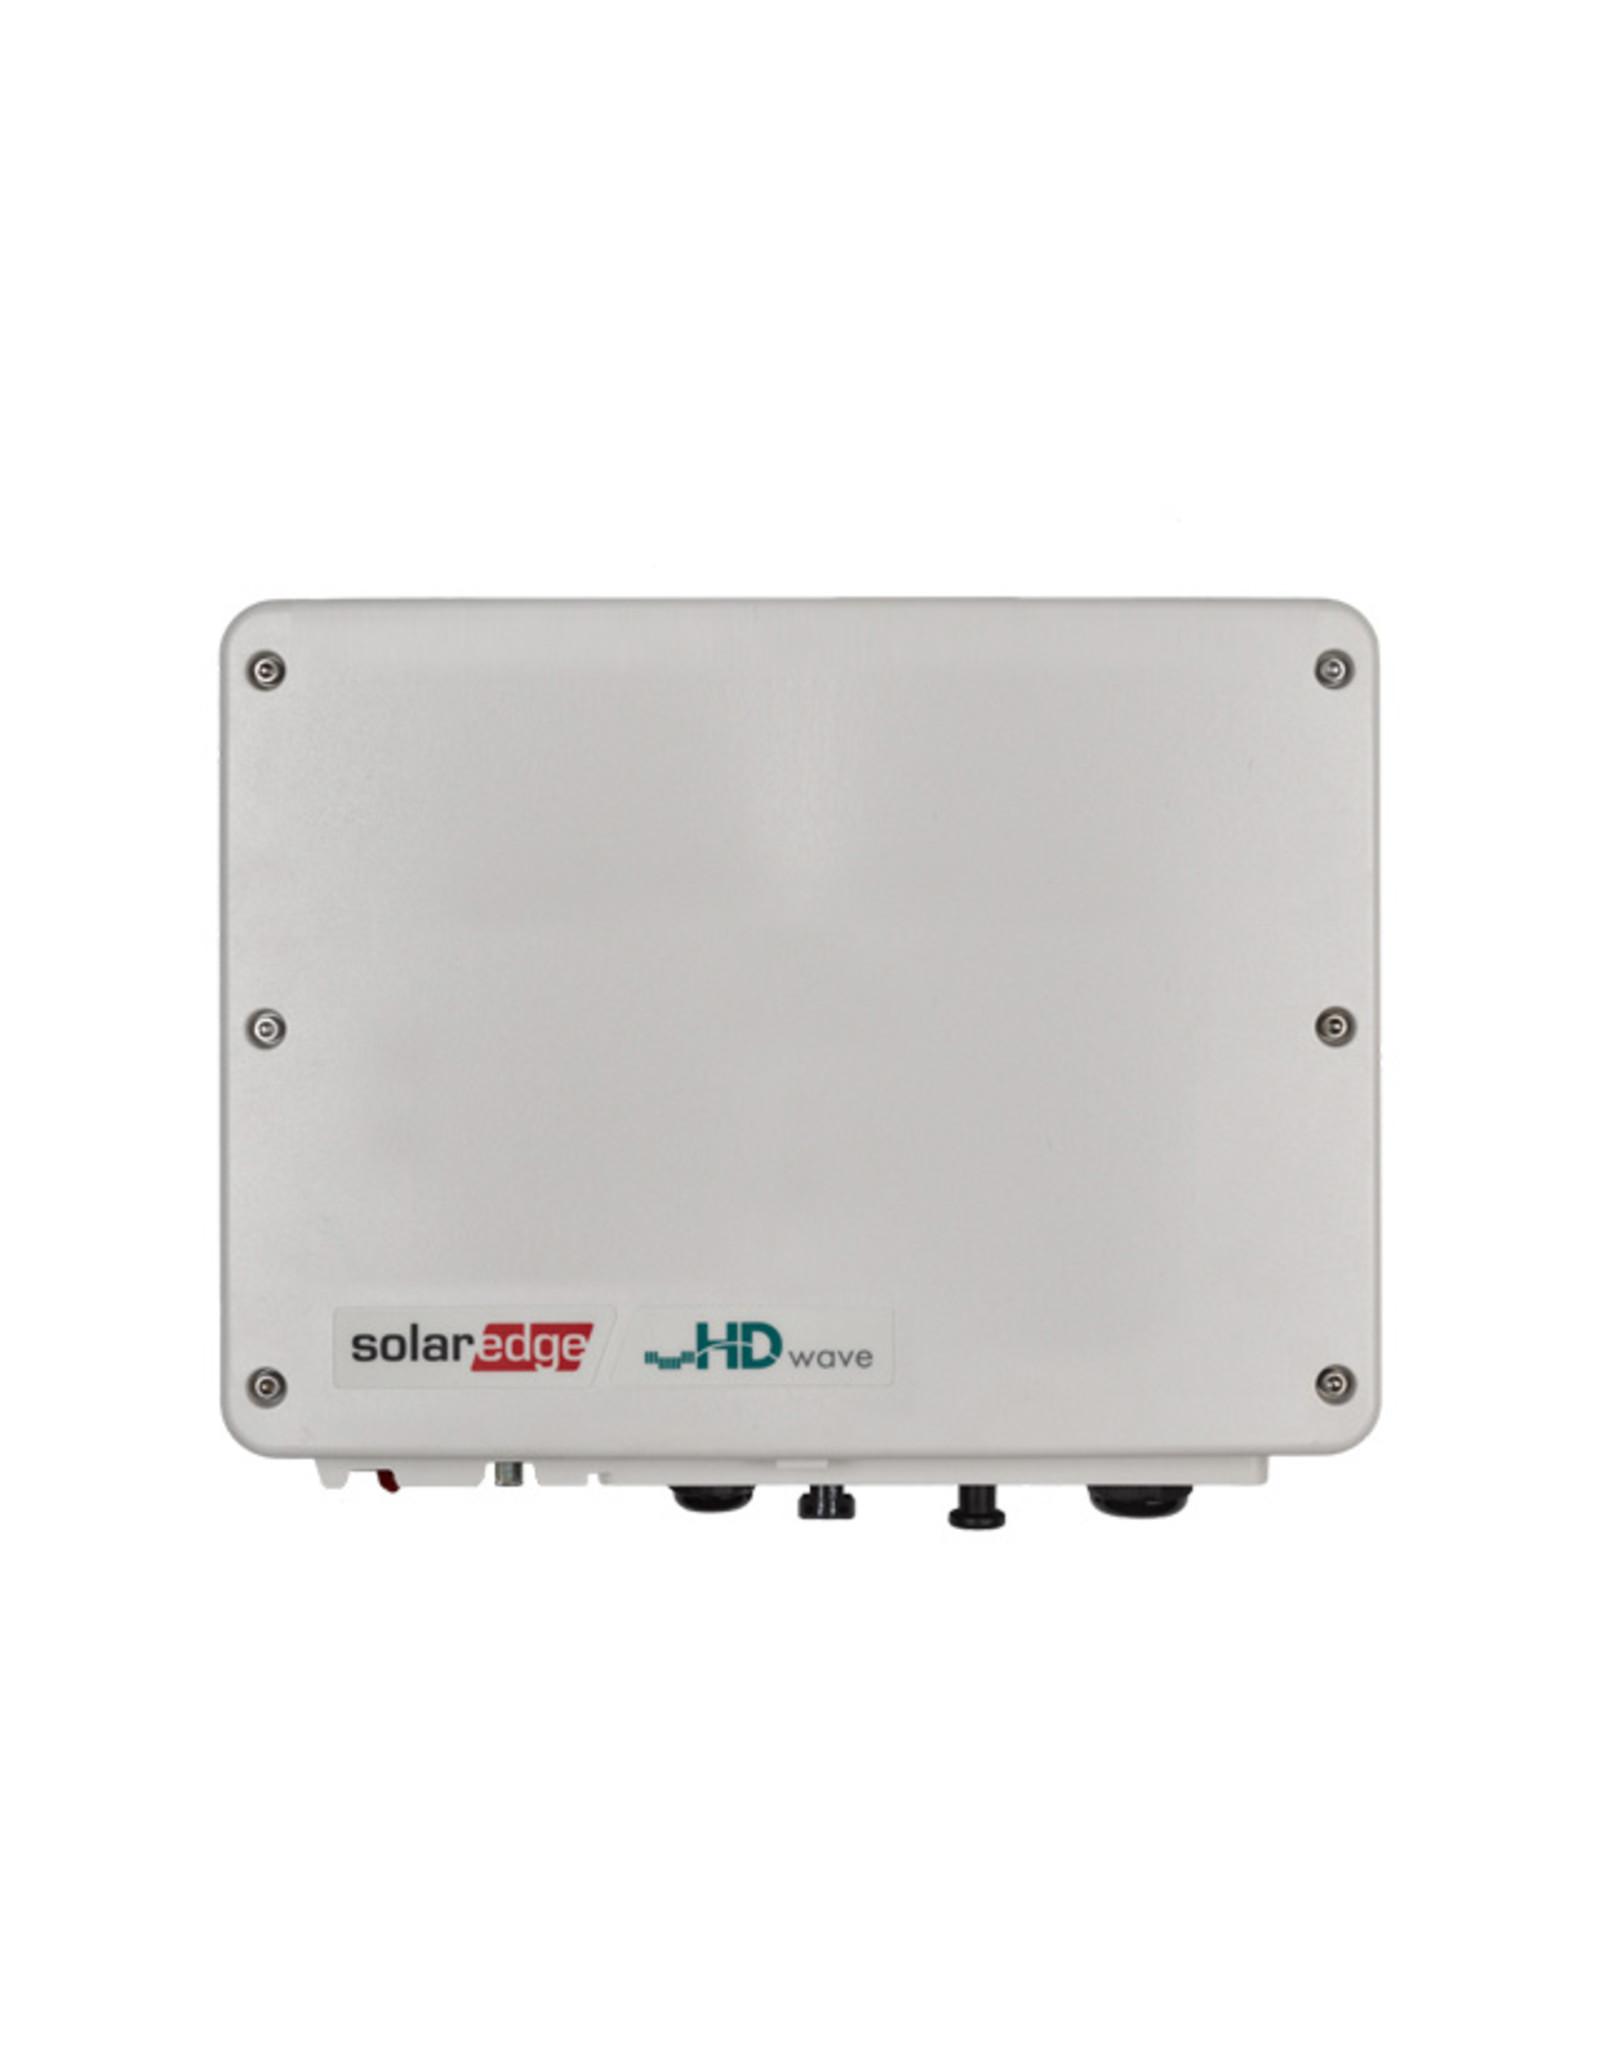 SolarEdge SolarEdge SE2200H enkelfase omvormer 2.2 kW HD-Wave - met SetApp configuratie